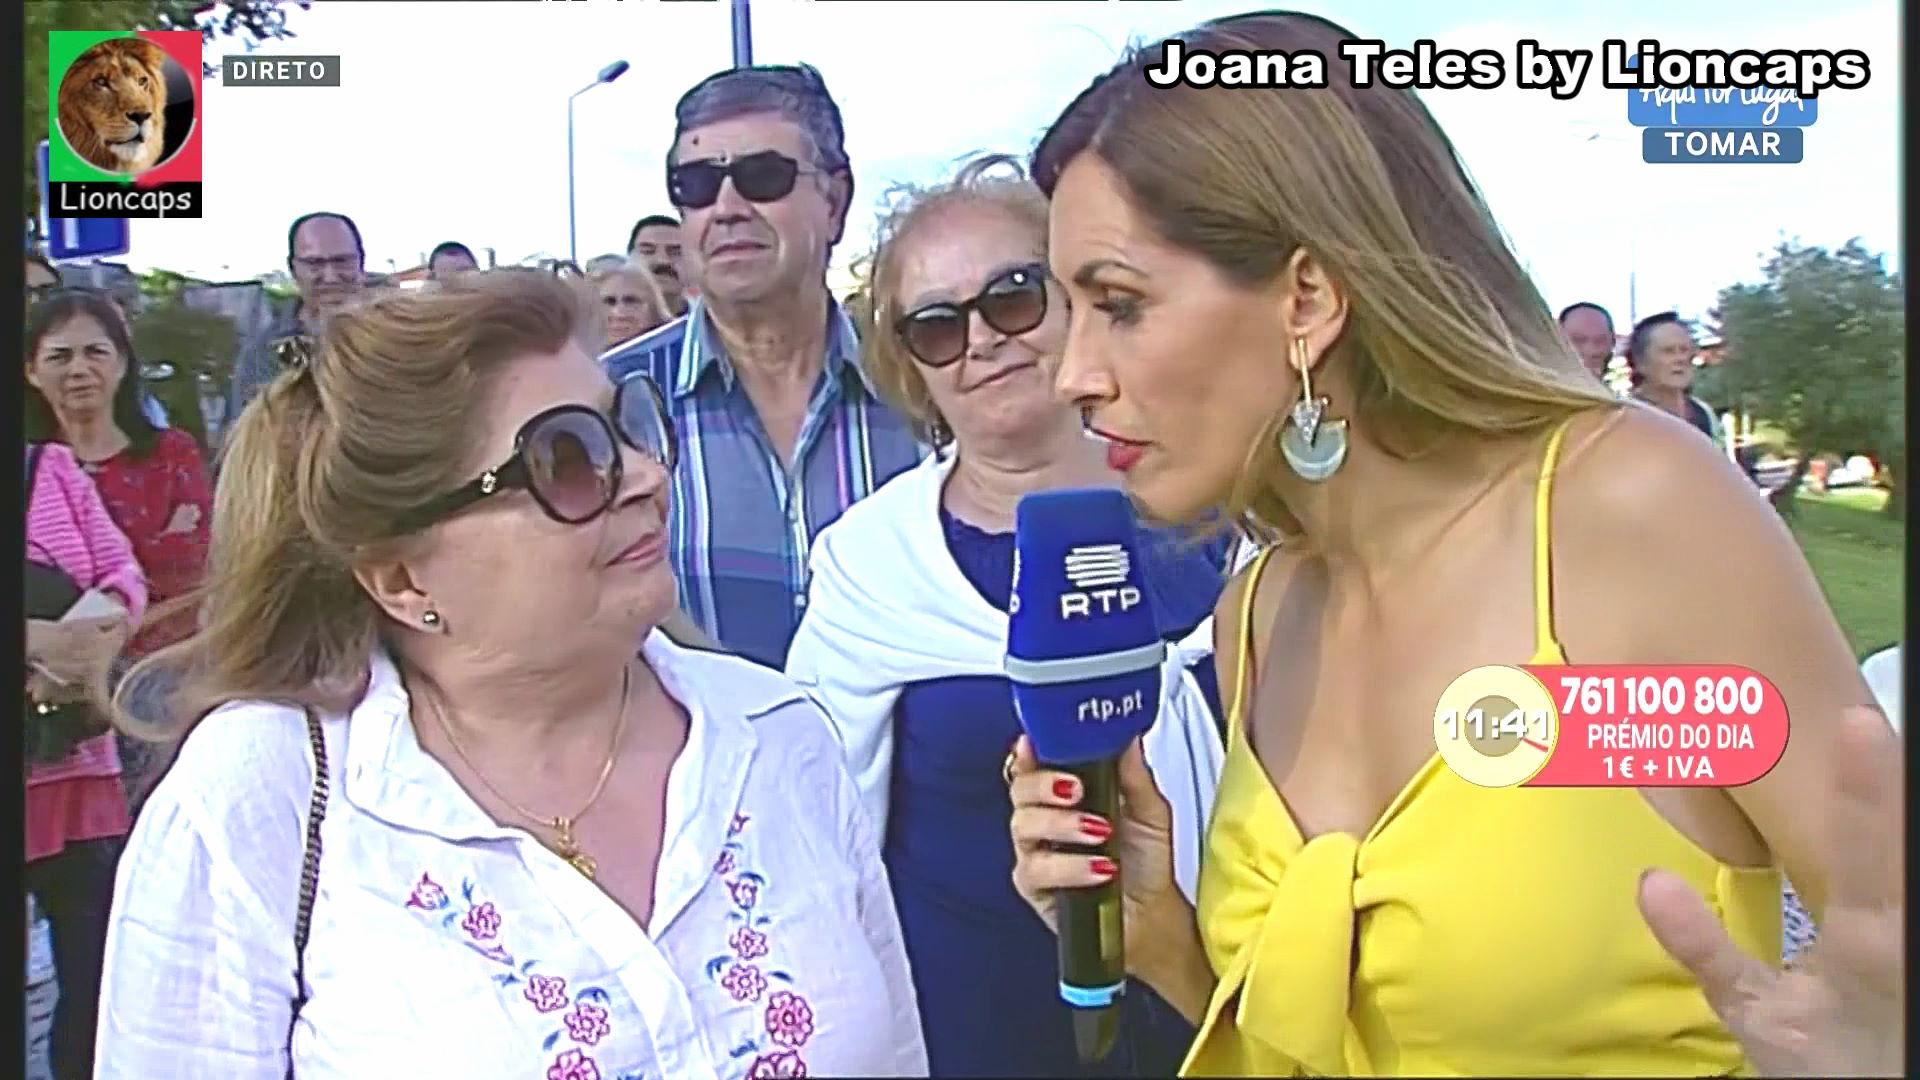 976678656_joana_teles_vs200125_11611_122_429lo.JPG